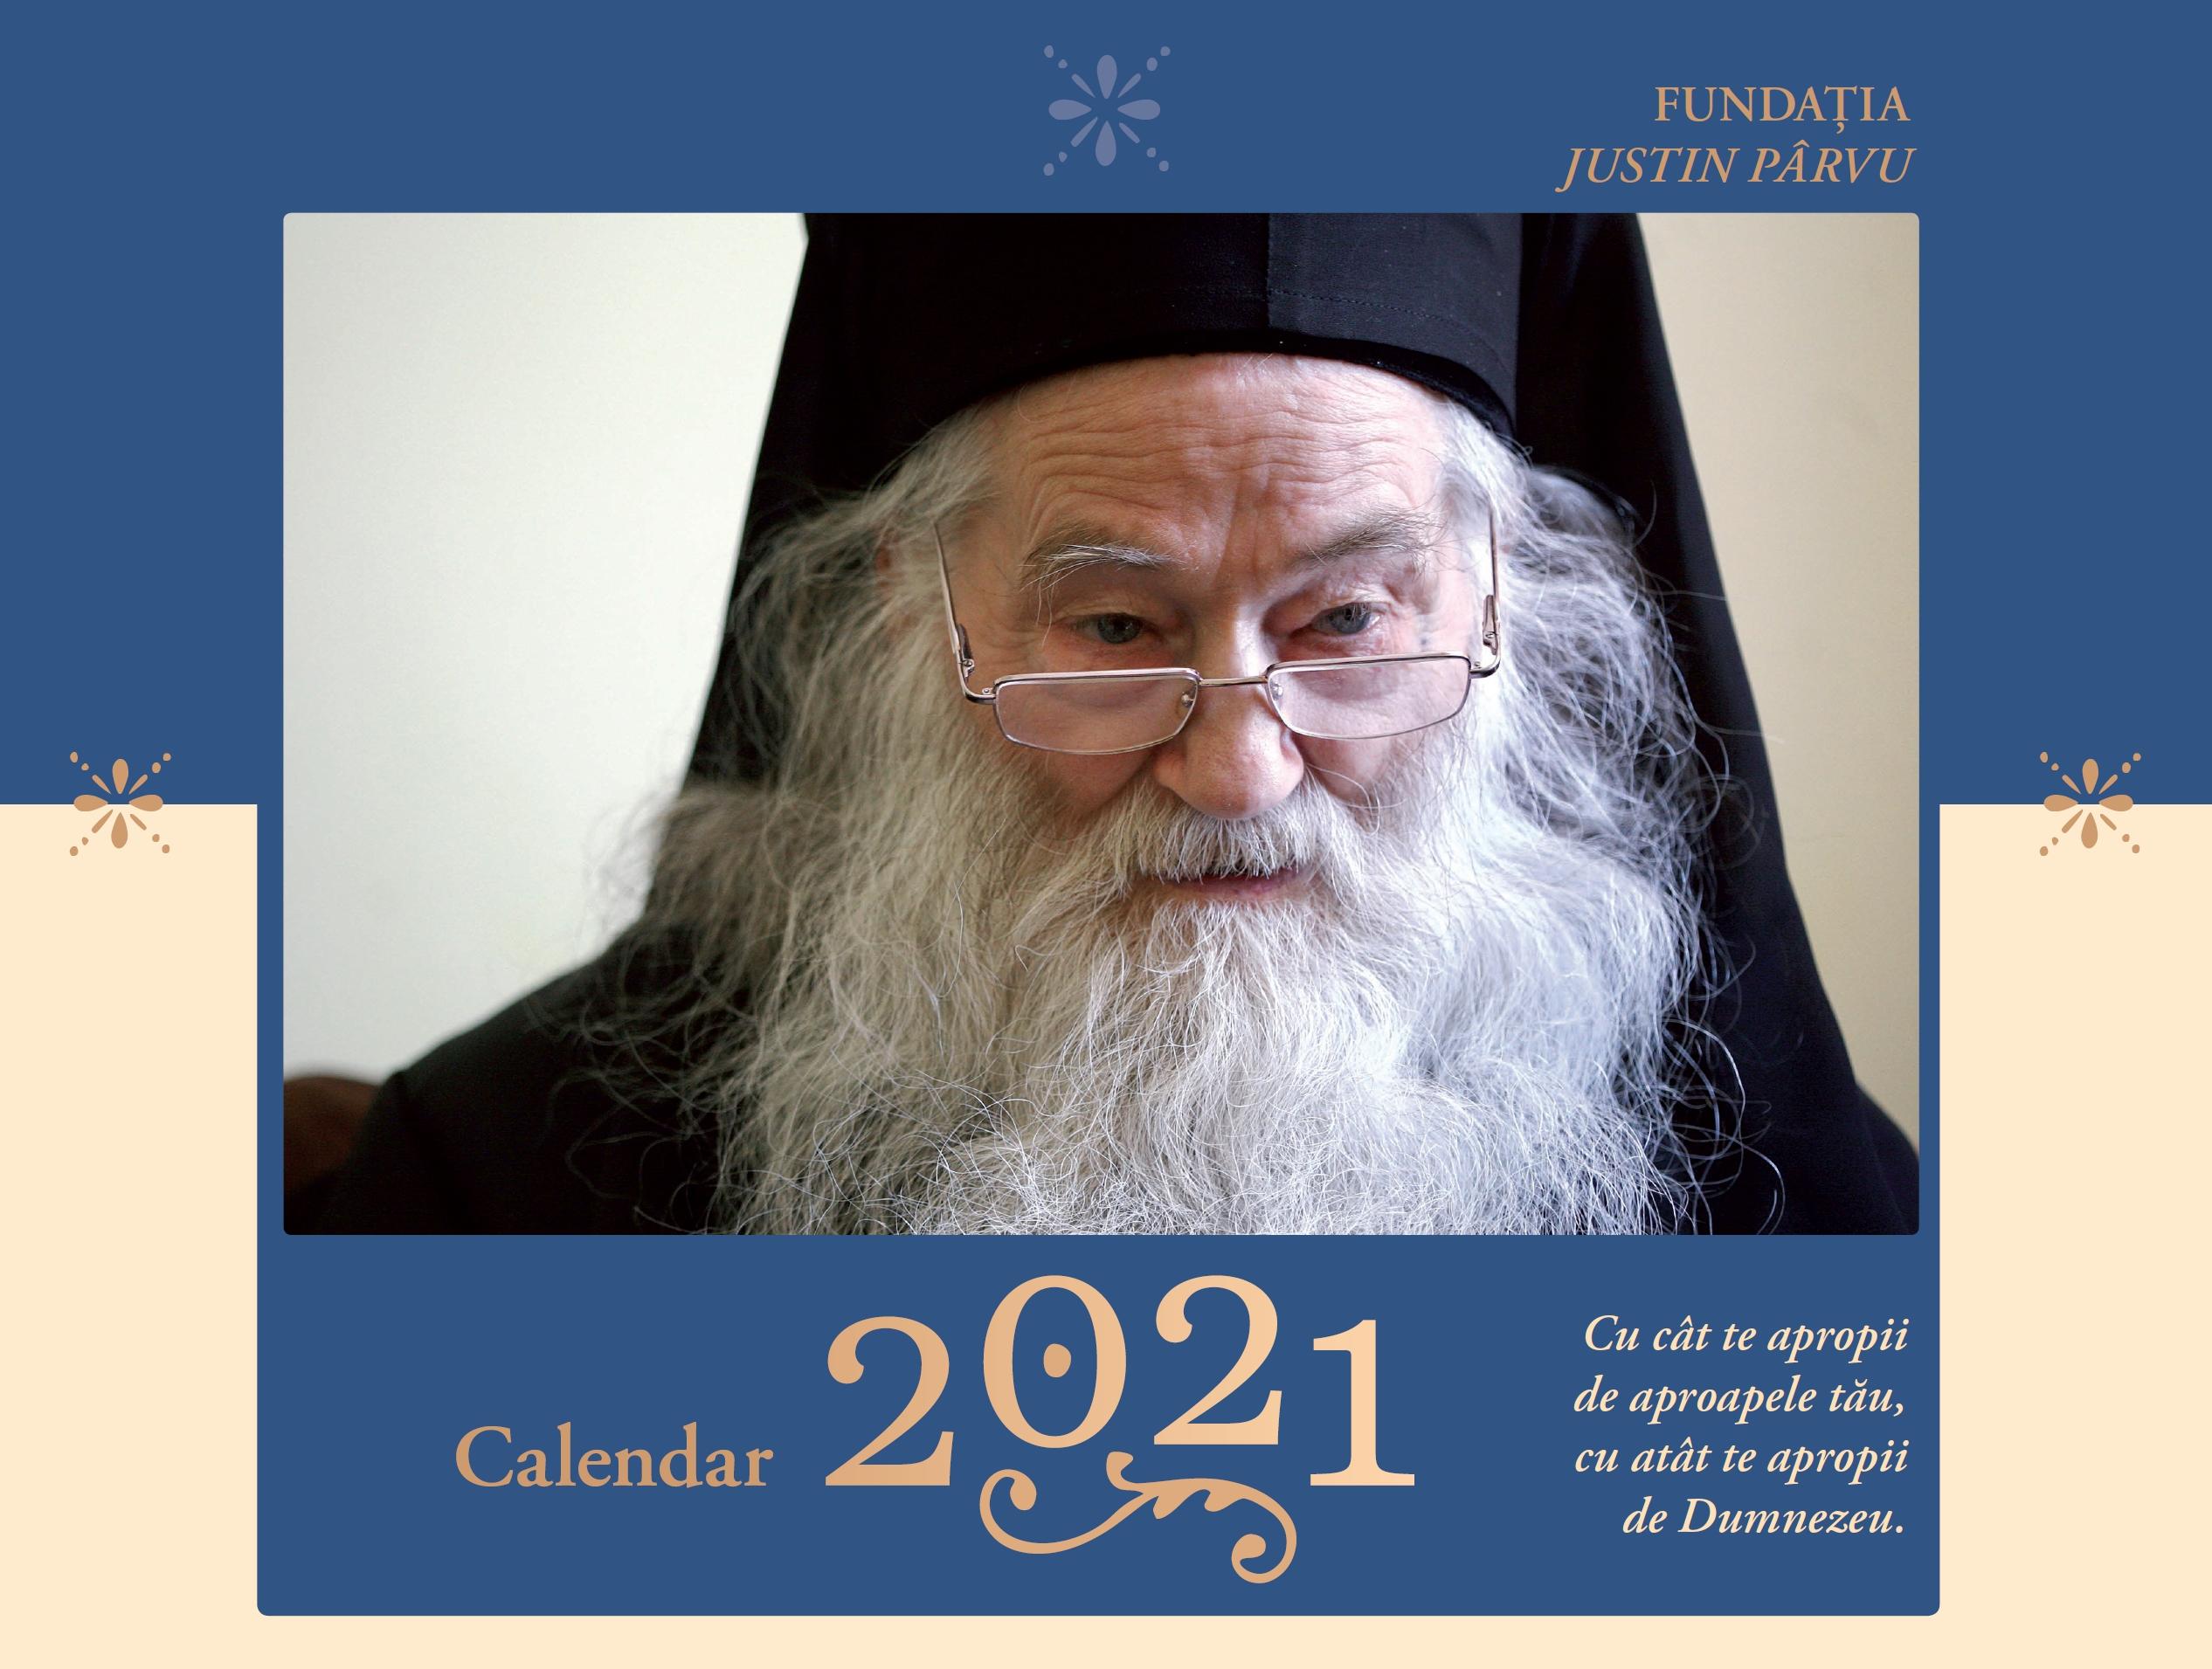 Calendar Ortodox 2021 cu Părintele Justin Pârvu coperta